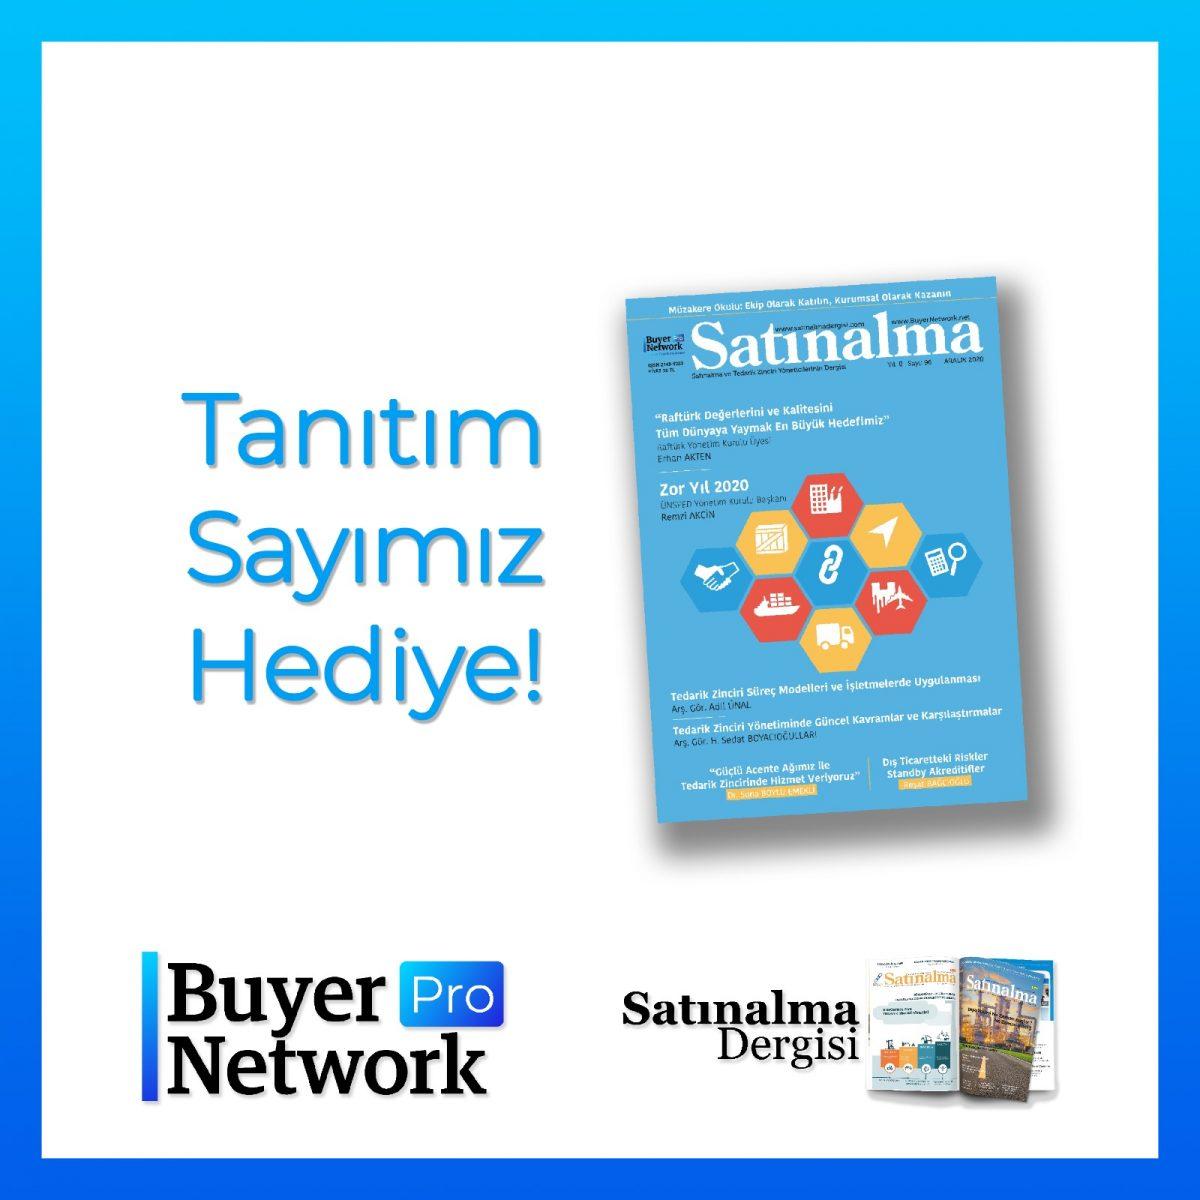 Satinalma_dergisi_hediye-1200x1200.jpeg